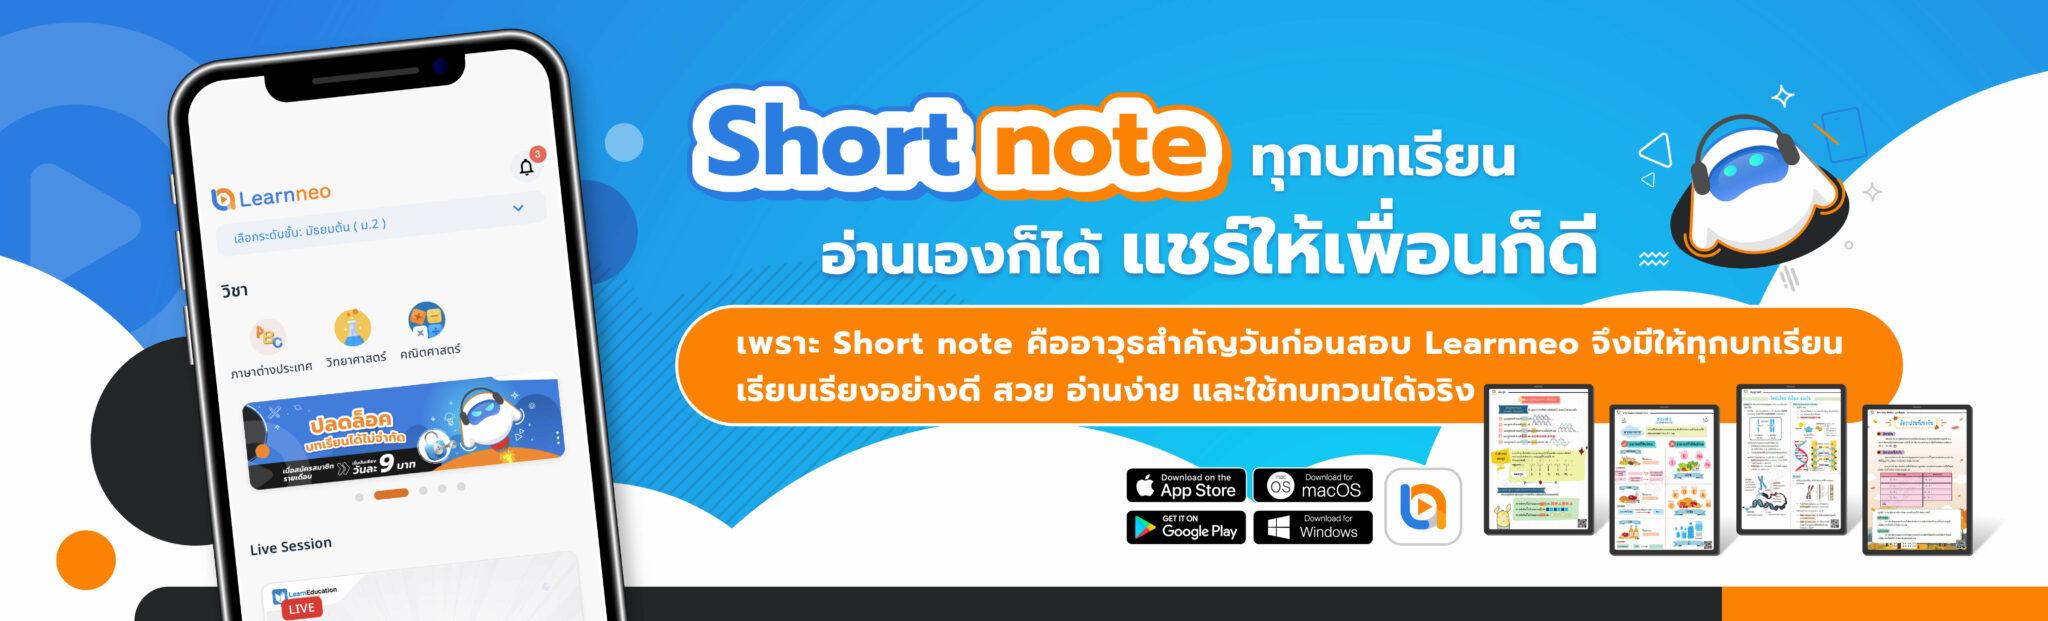 shortnote